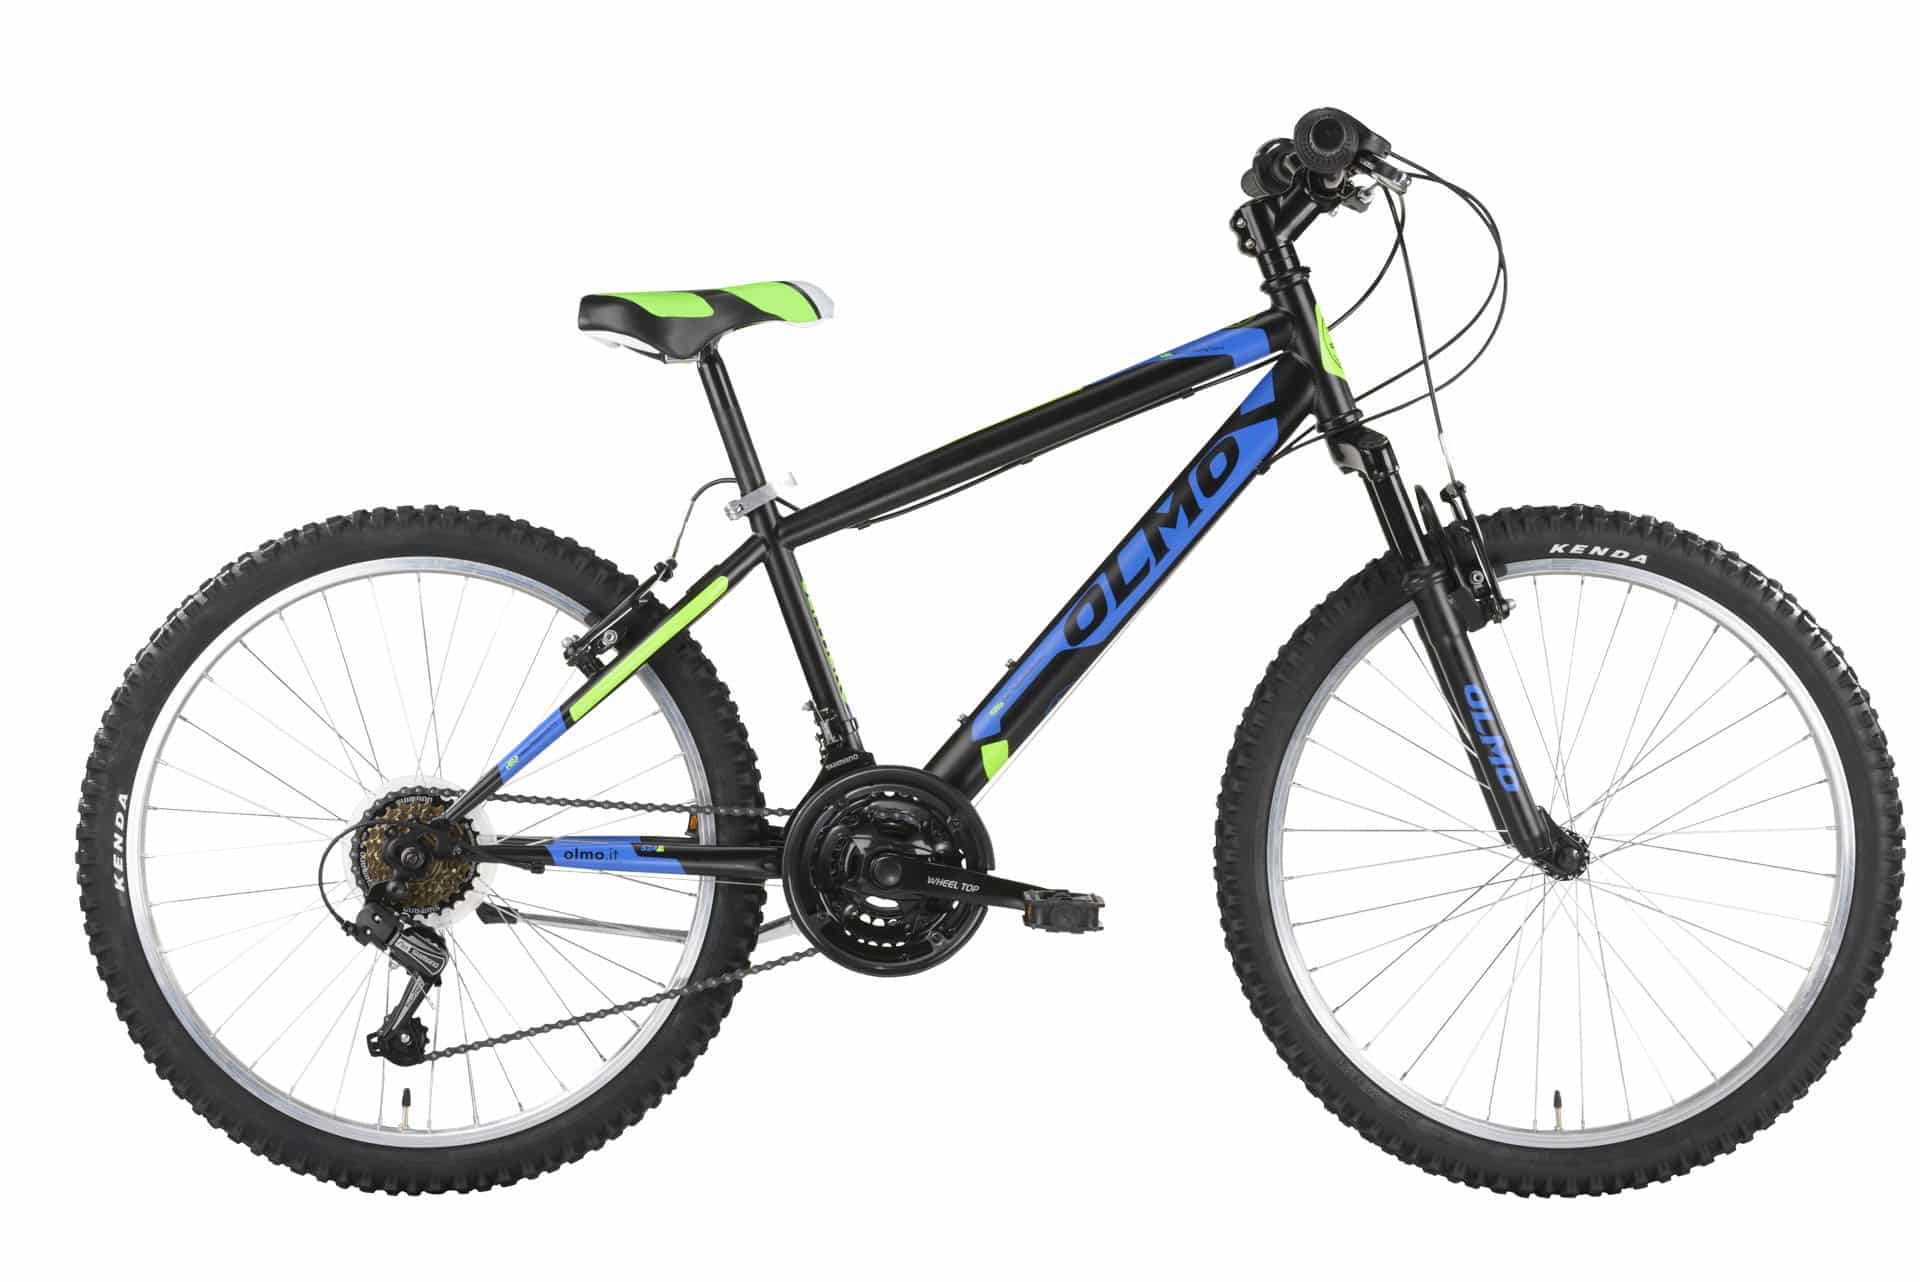 Ro7118 M Sentiero 24 Mtb 3x6 Bici Olmo